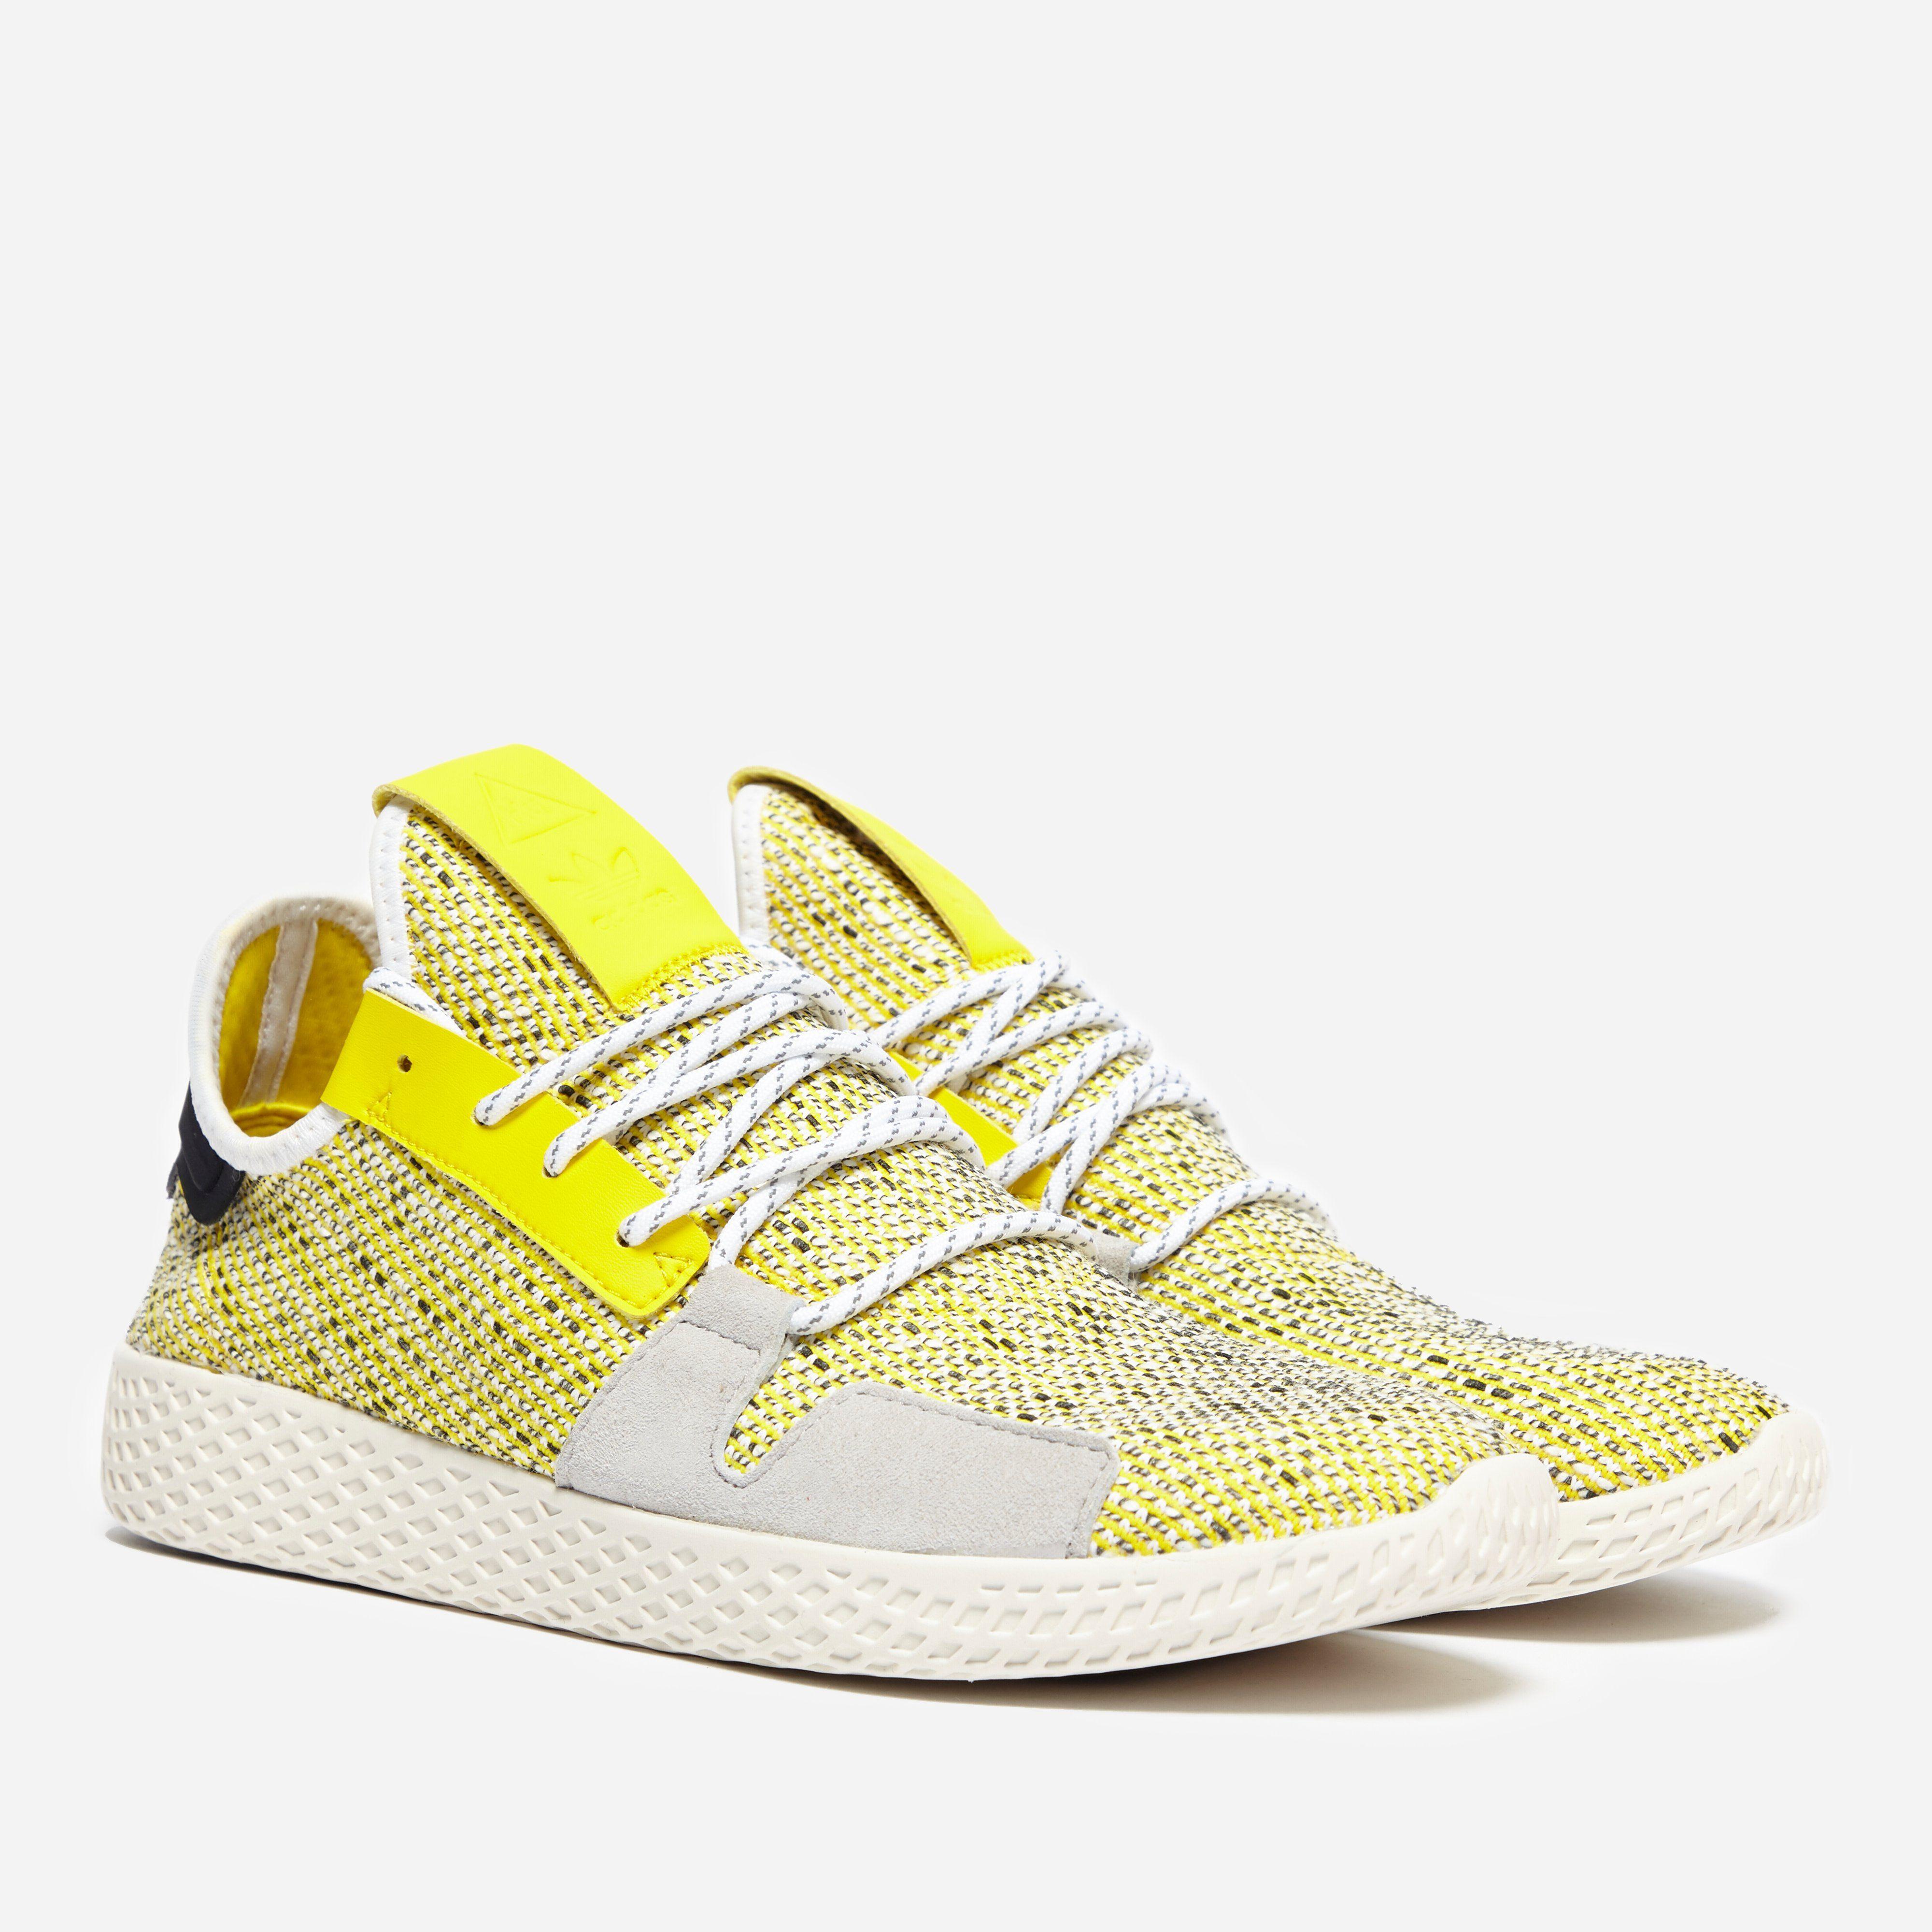 284bb3cf65927 adidas Originals x Pharrell Williams Solar HU Tennis V2  Afro Pack ...